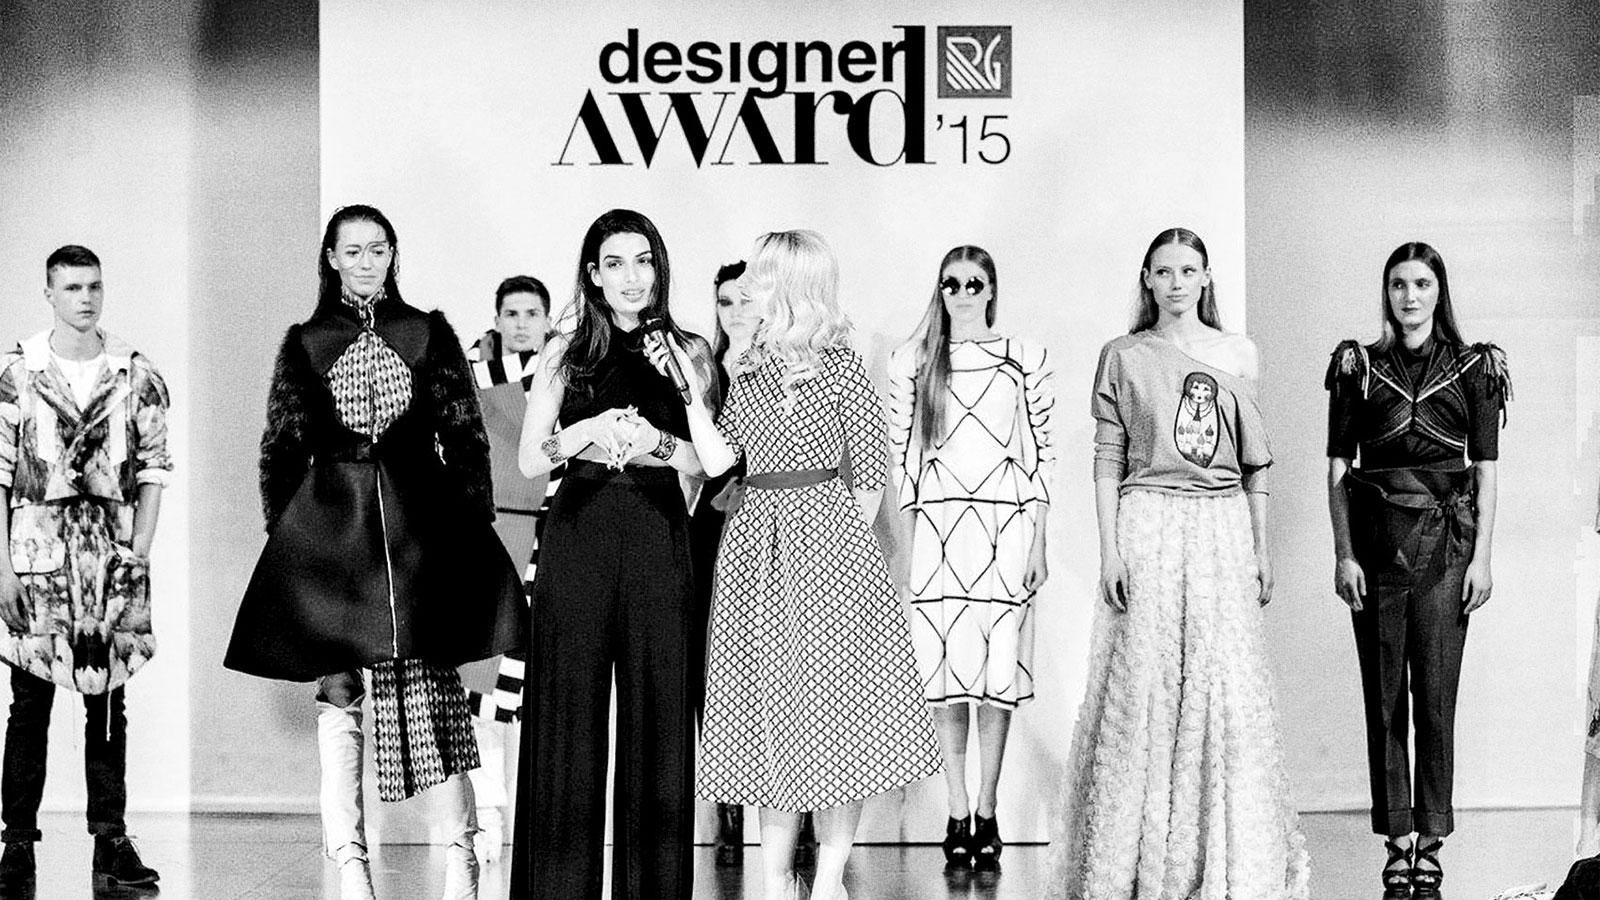 rg-designer-award-logo-1600x900-1